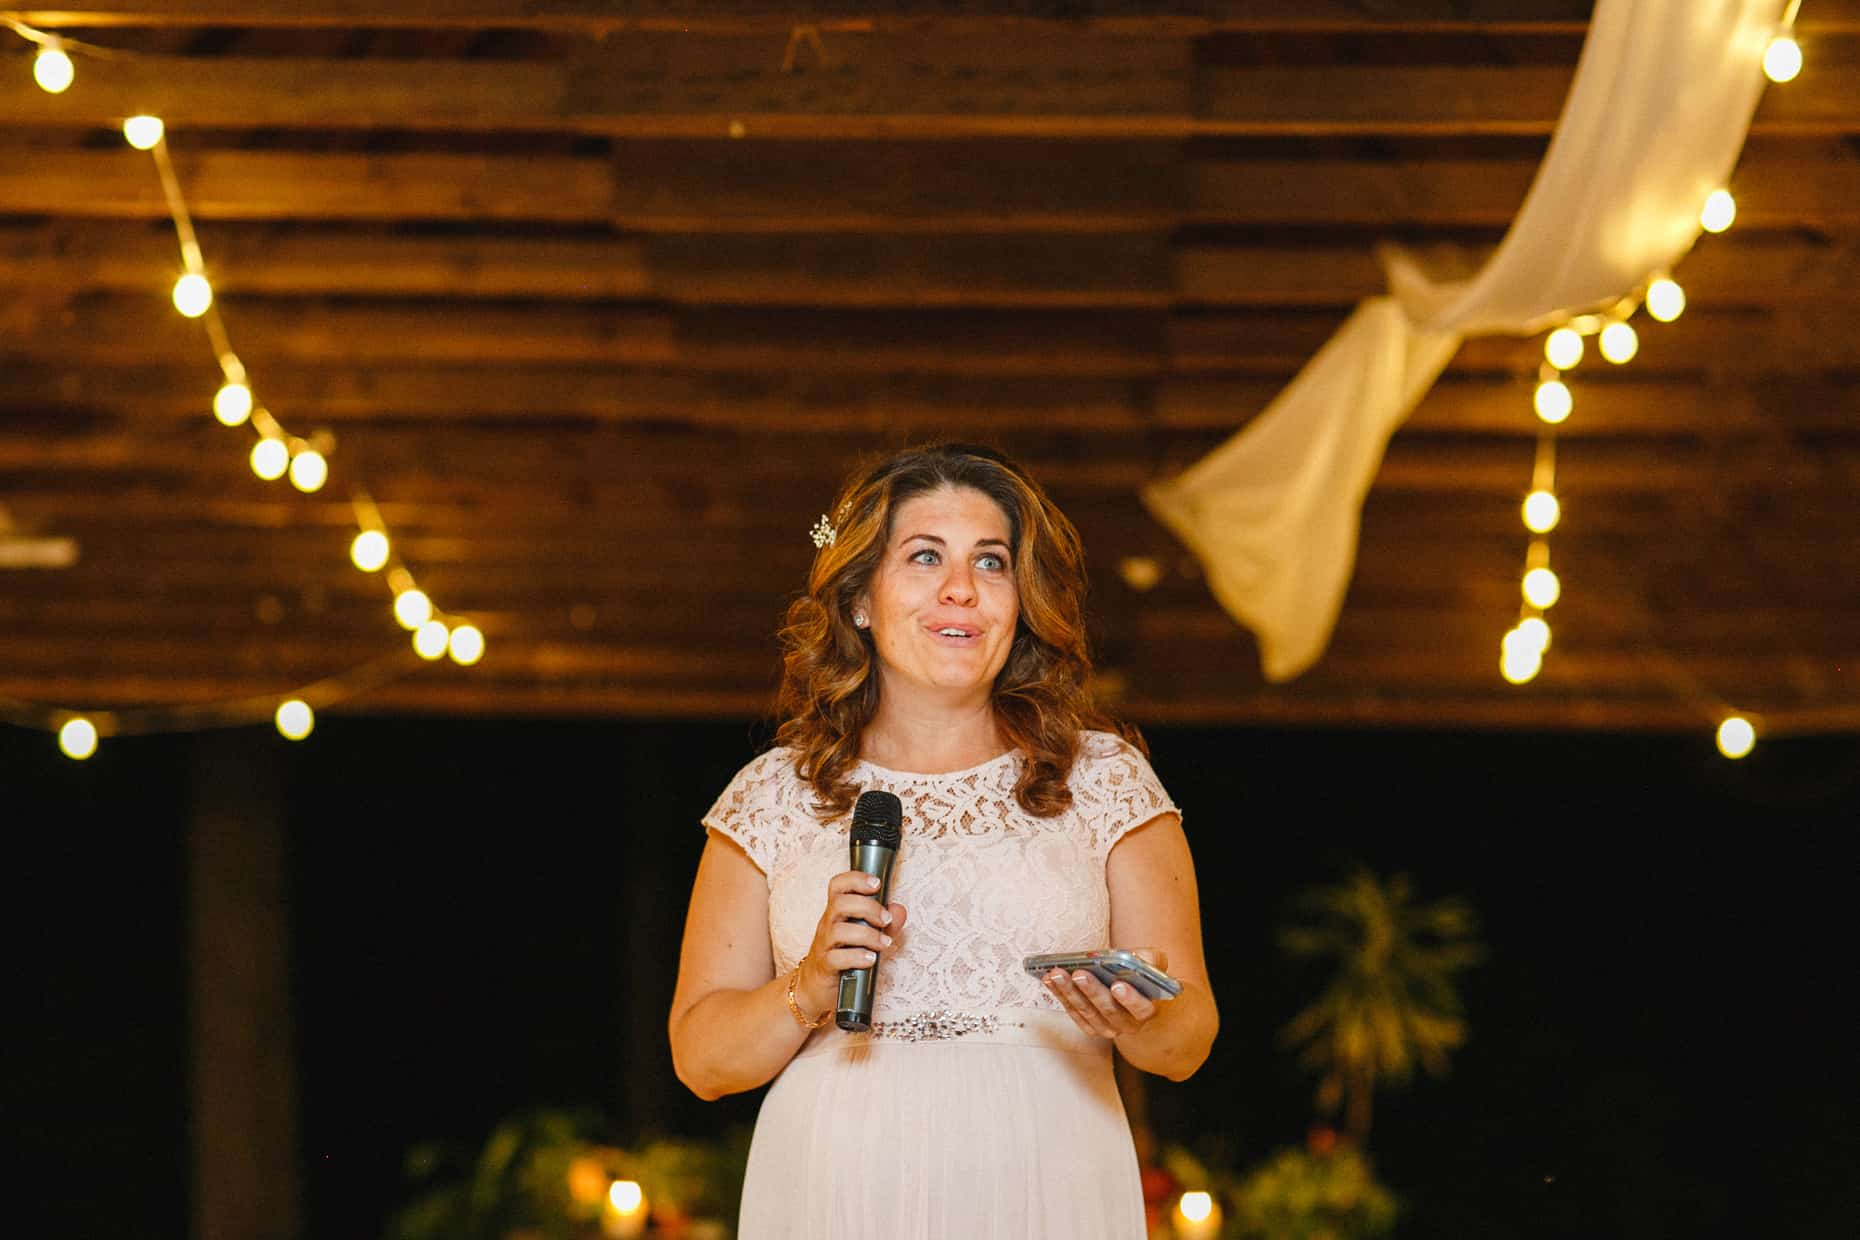 Phoenixville wedding reception venues